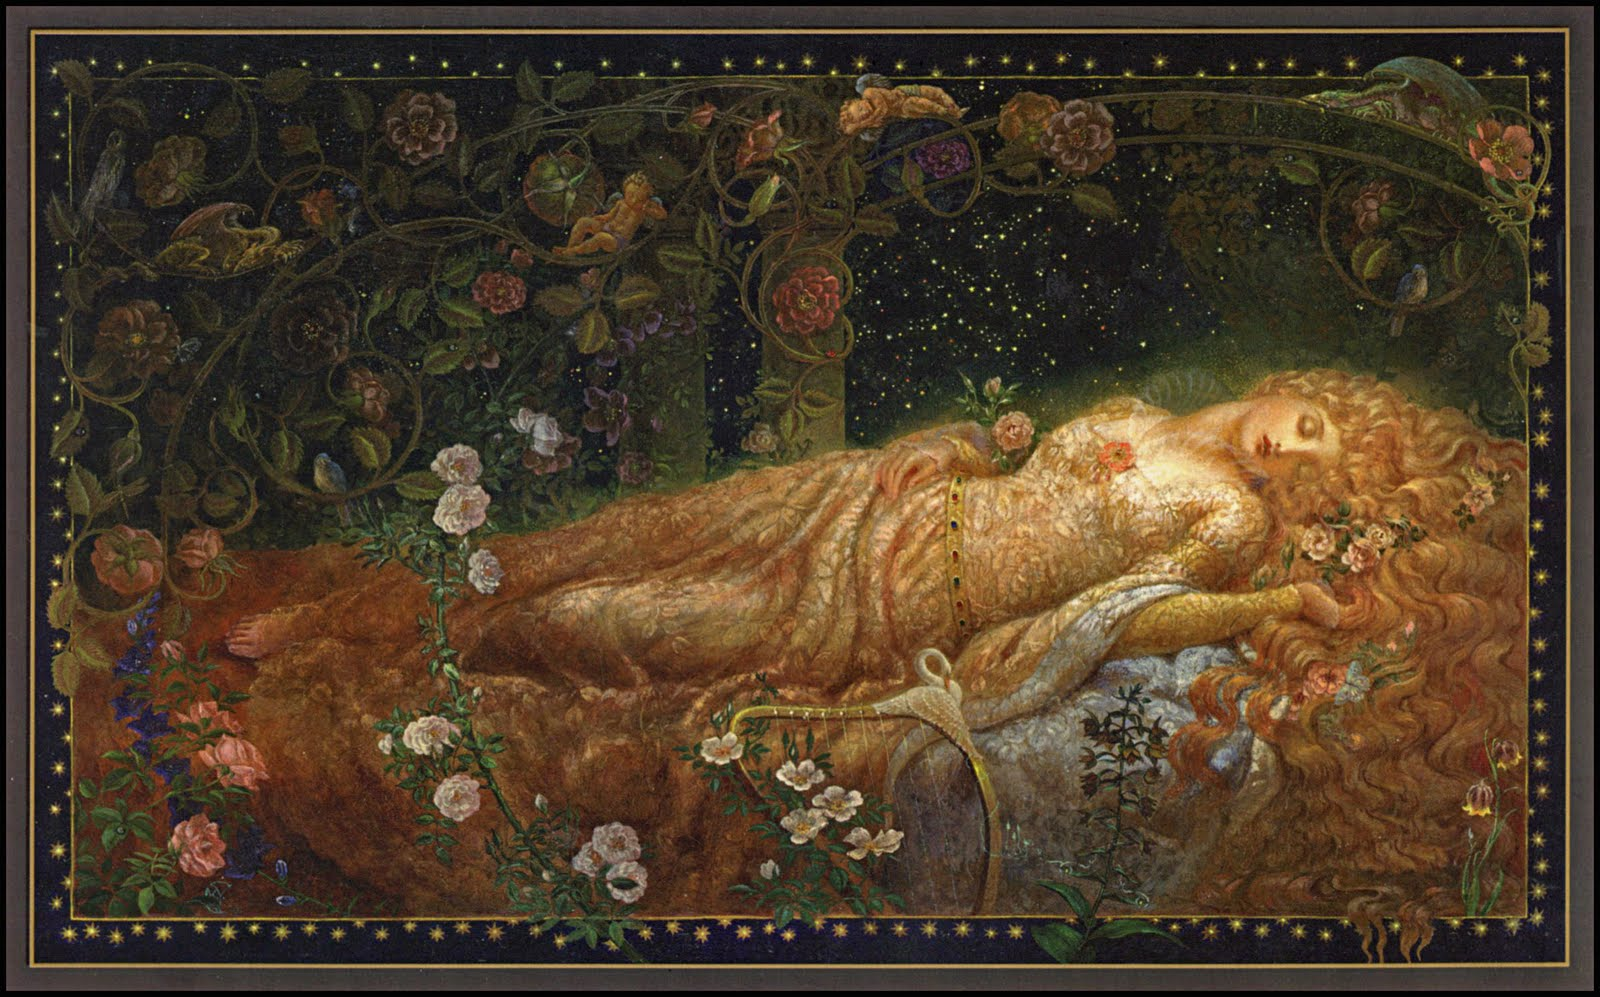 Sleeping Beauty by Kinuko V. Craft